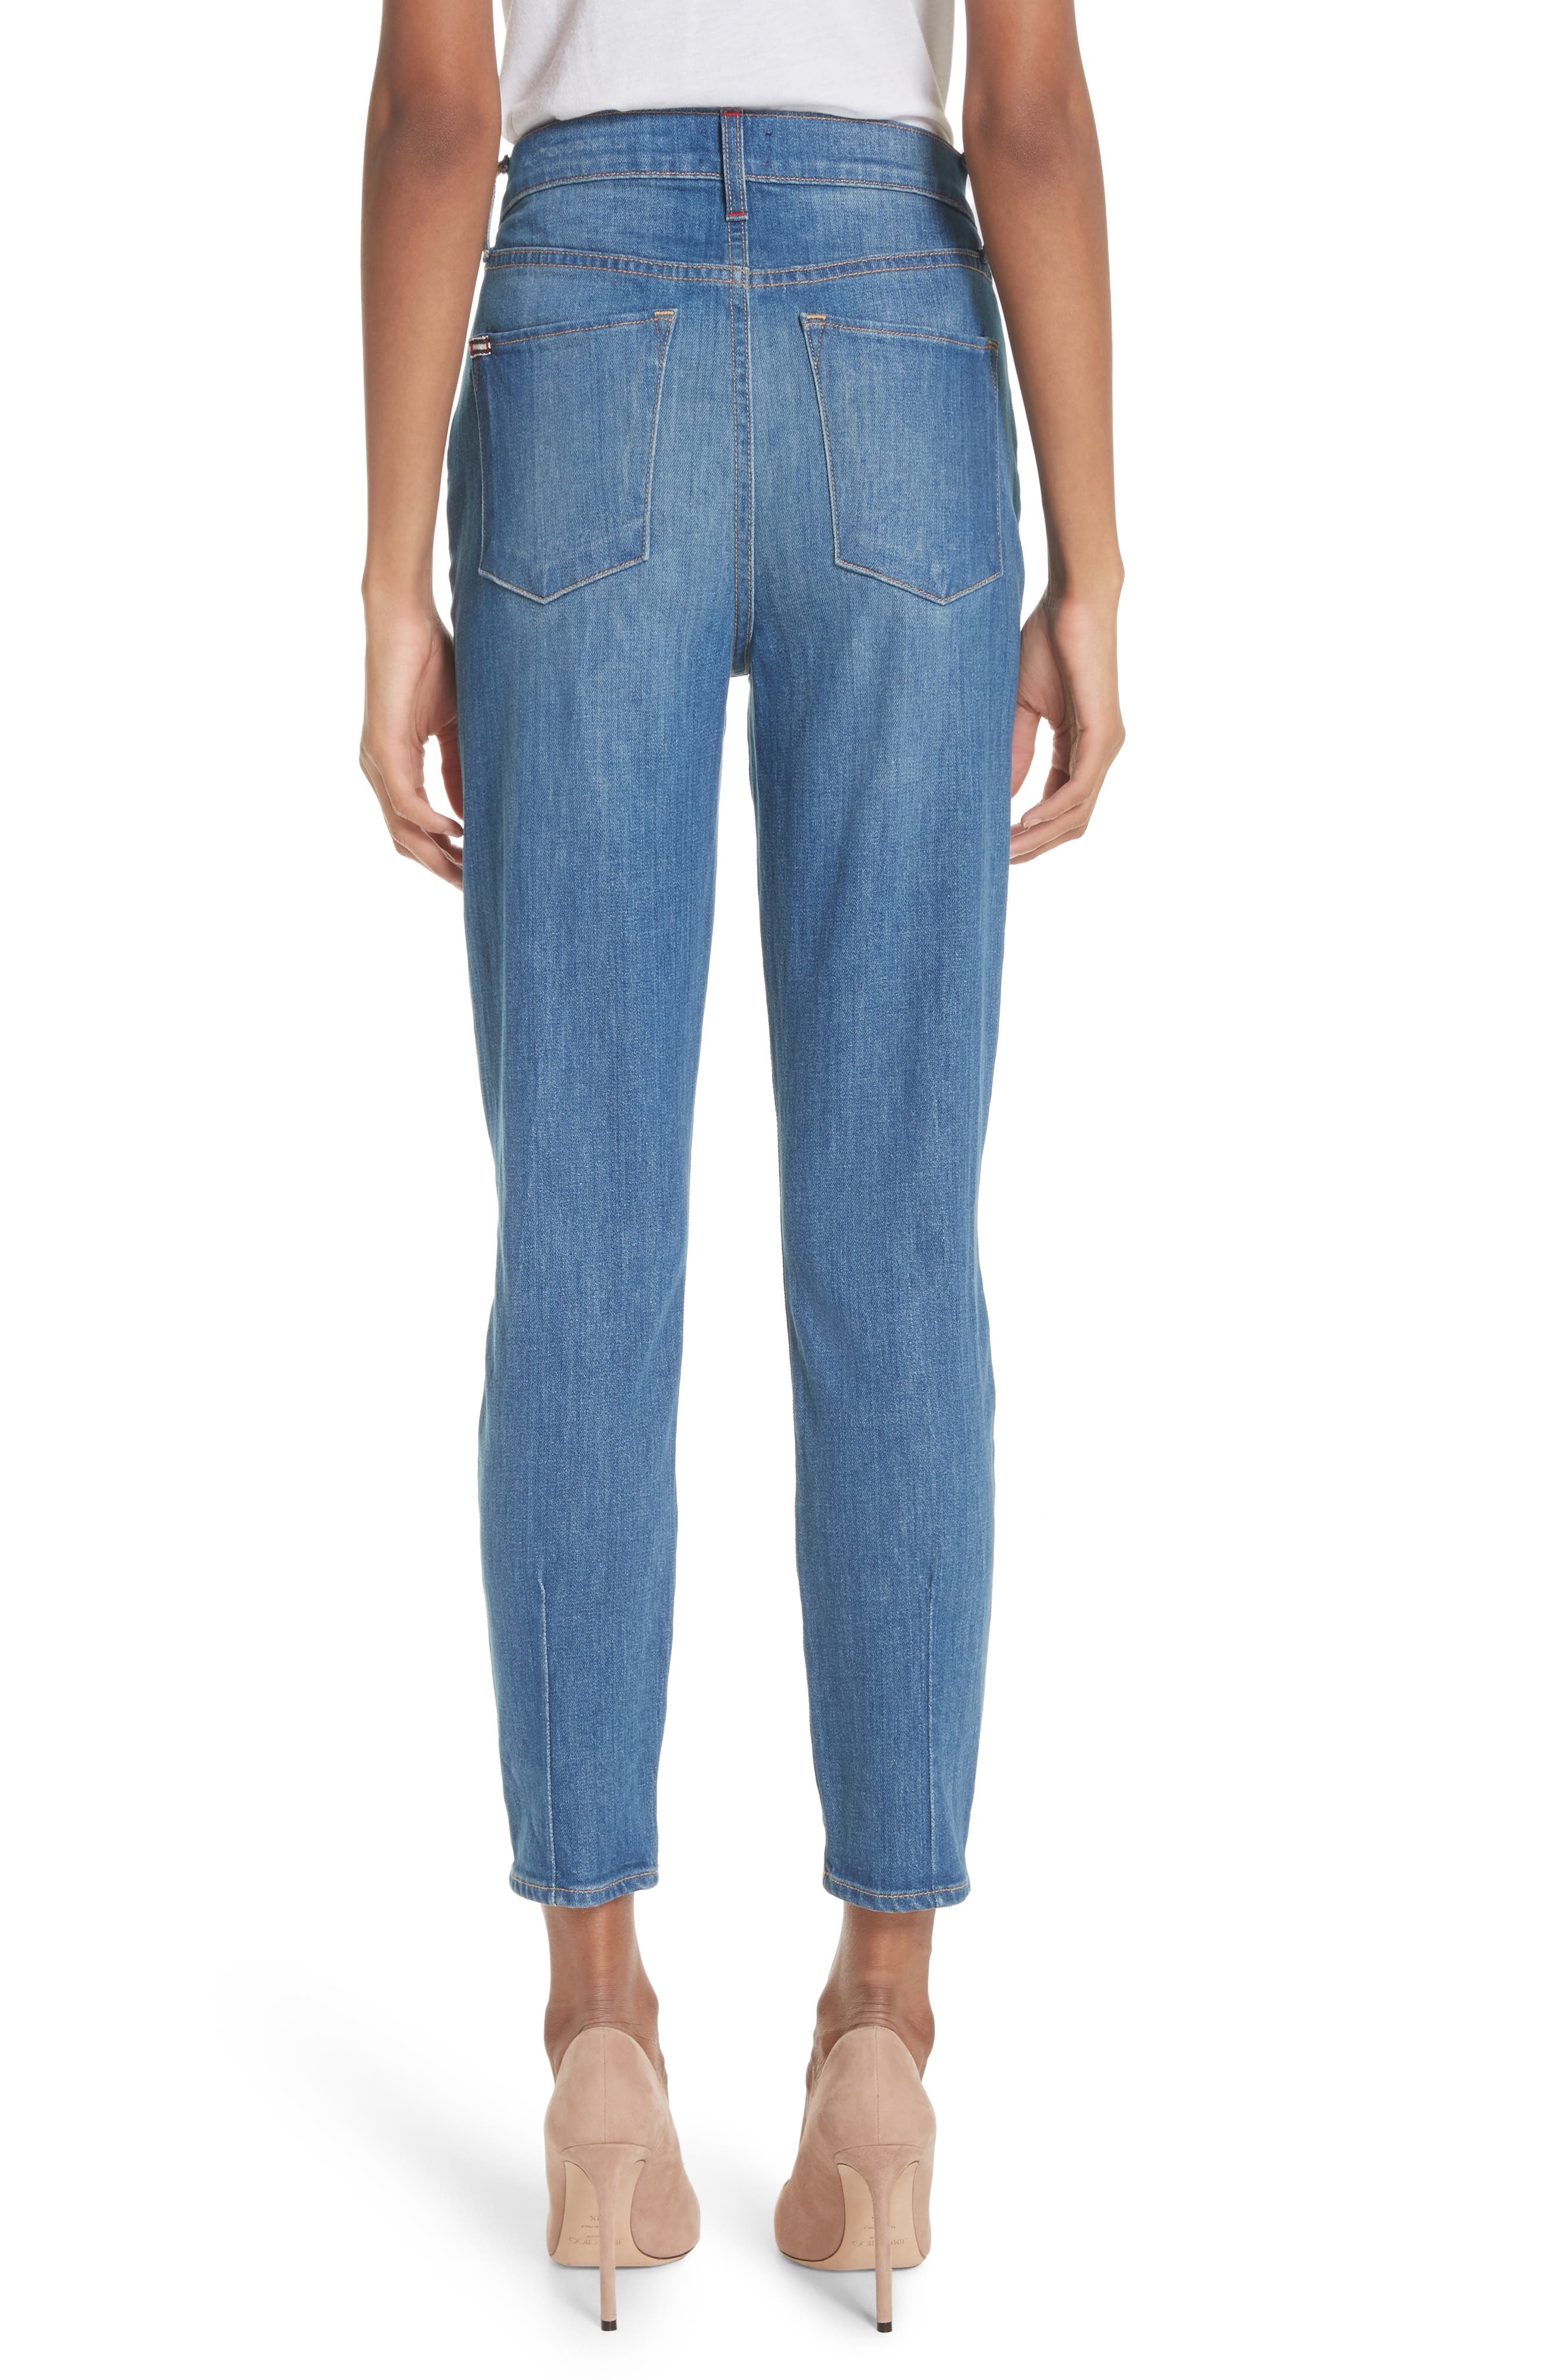 AO.LA Good High Waist Ankle Skinny Jeans,                             Alternate thumbnail 2, color,